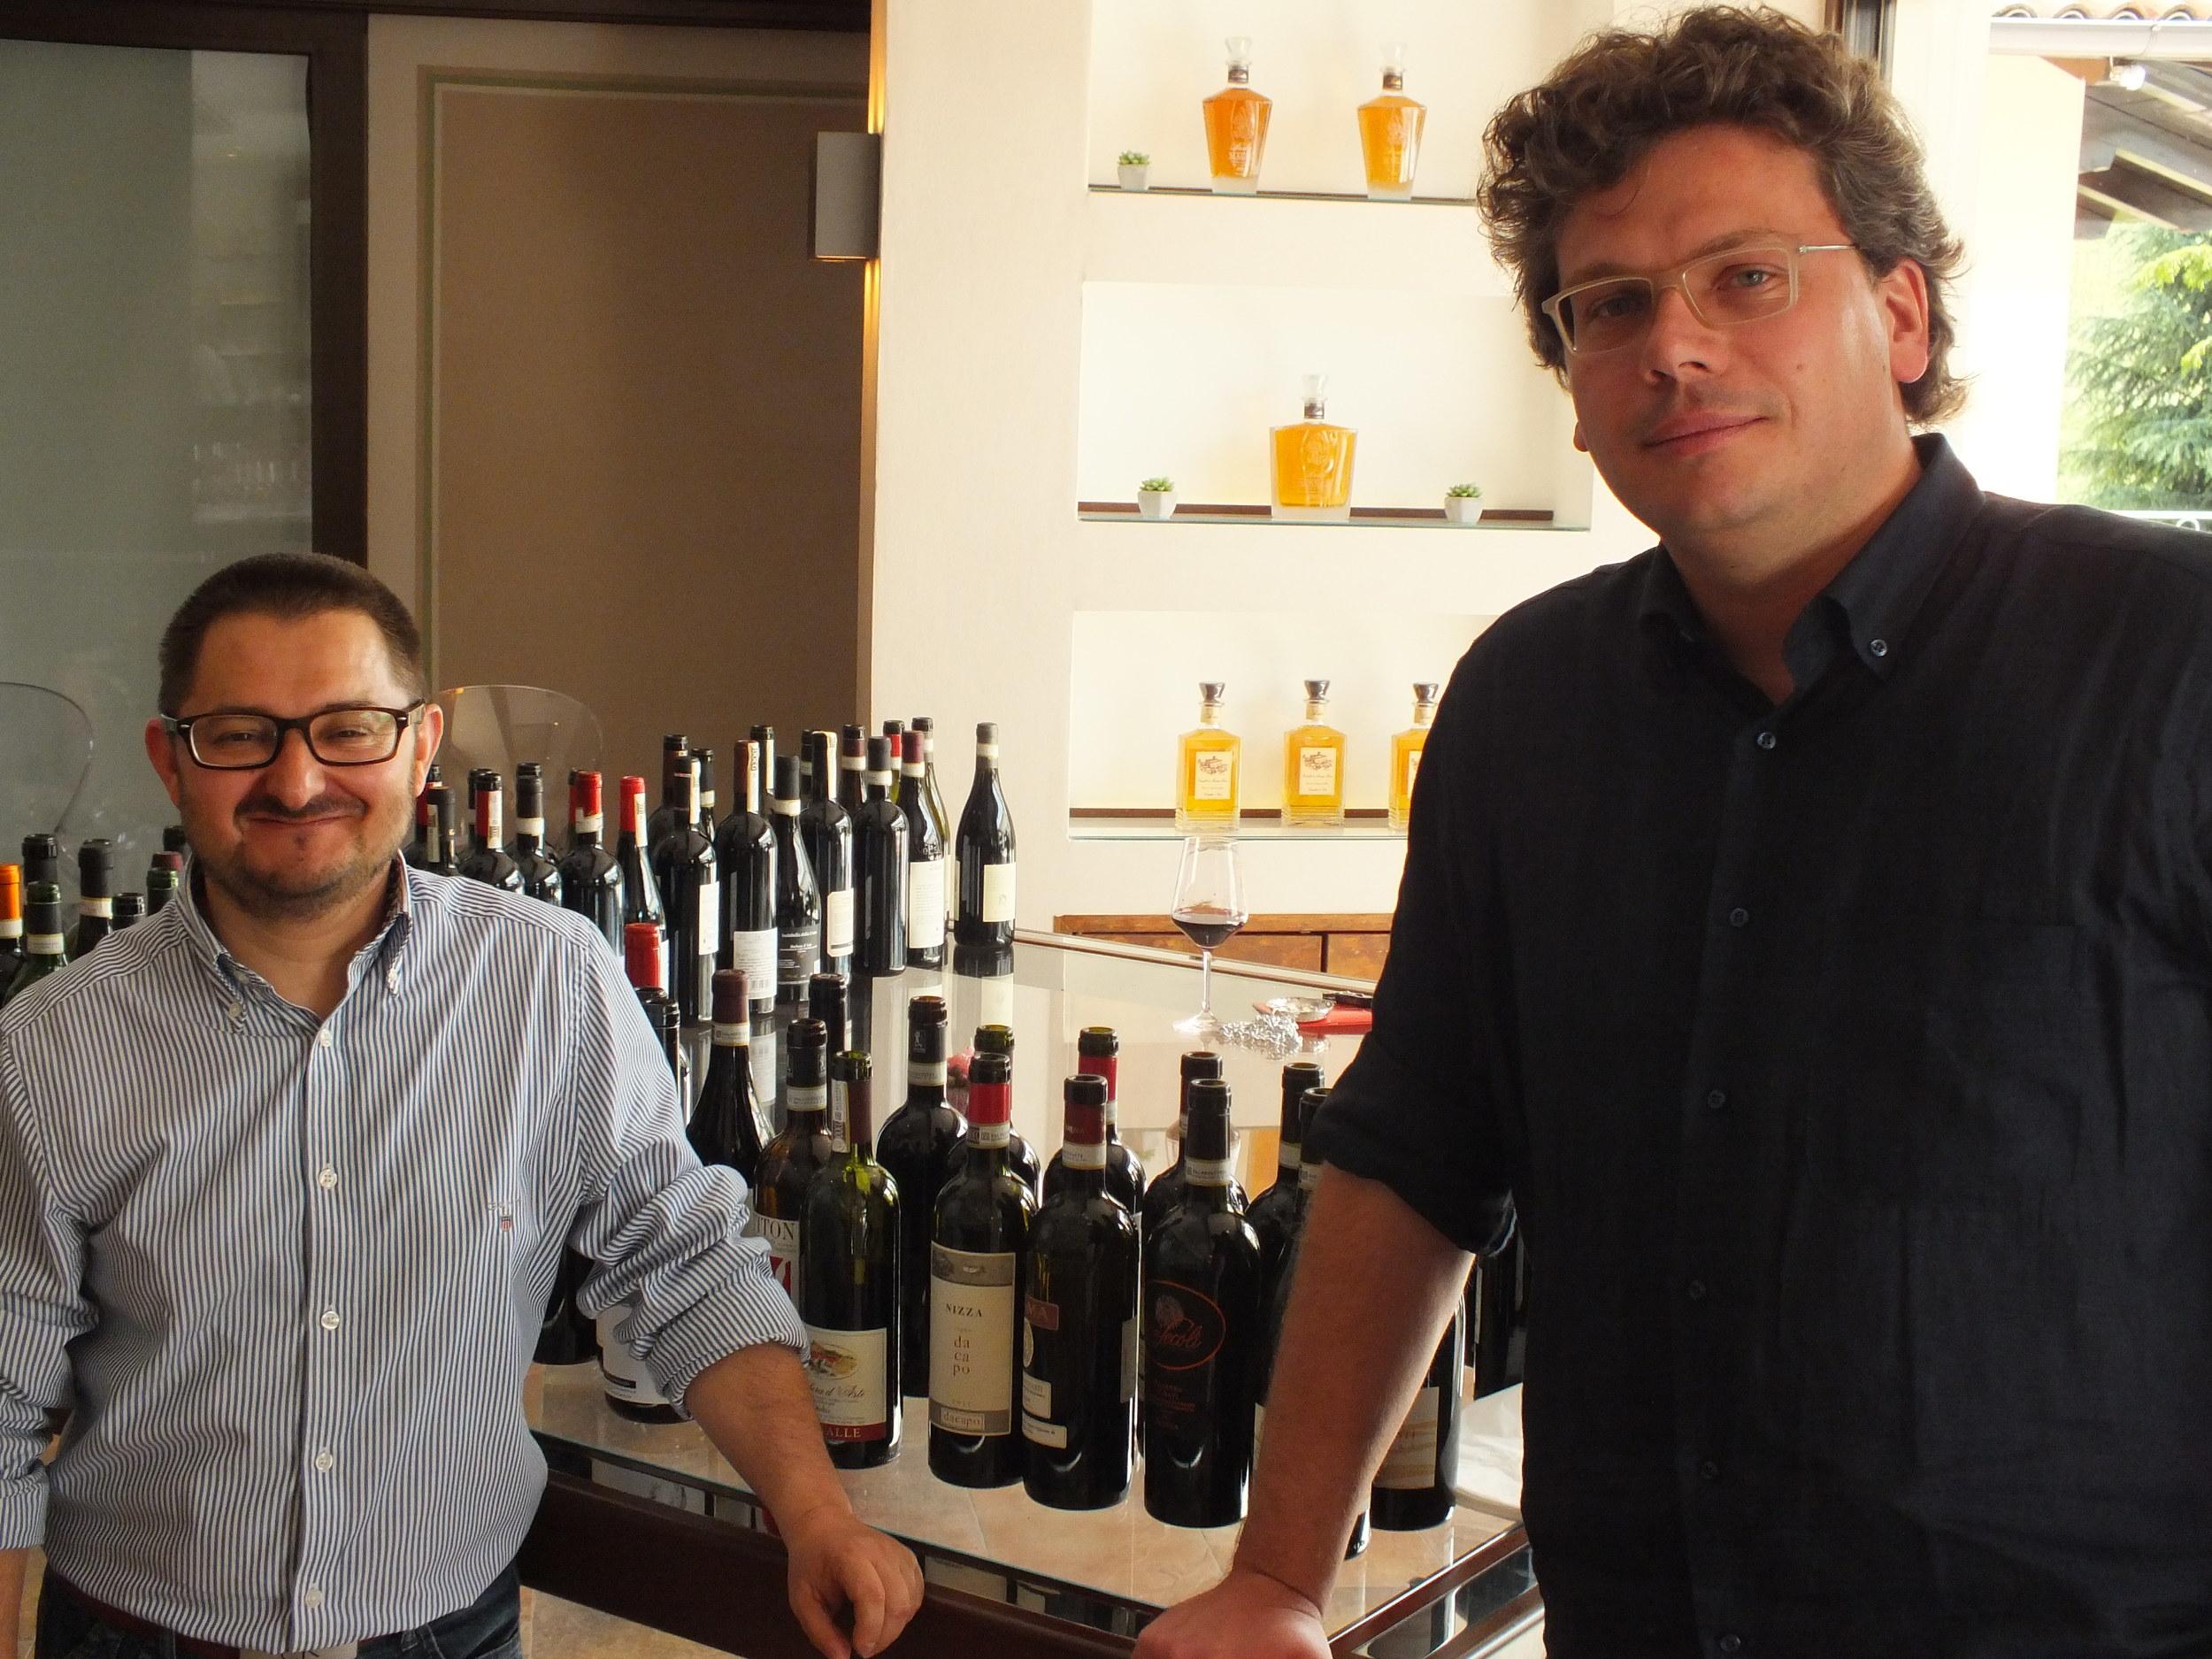 Gianni Bertolino (right) President of Associazione Produttori del Nizza and Daniele Chiappone of Erede du Chiappone